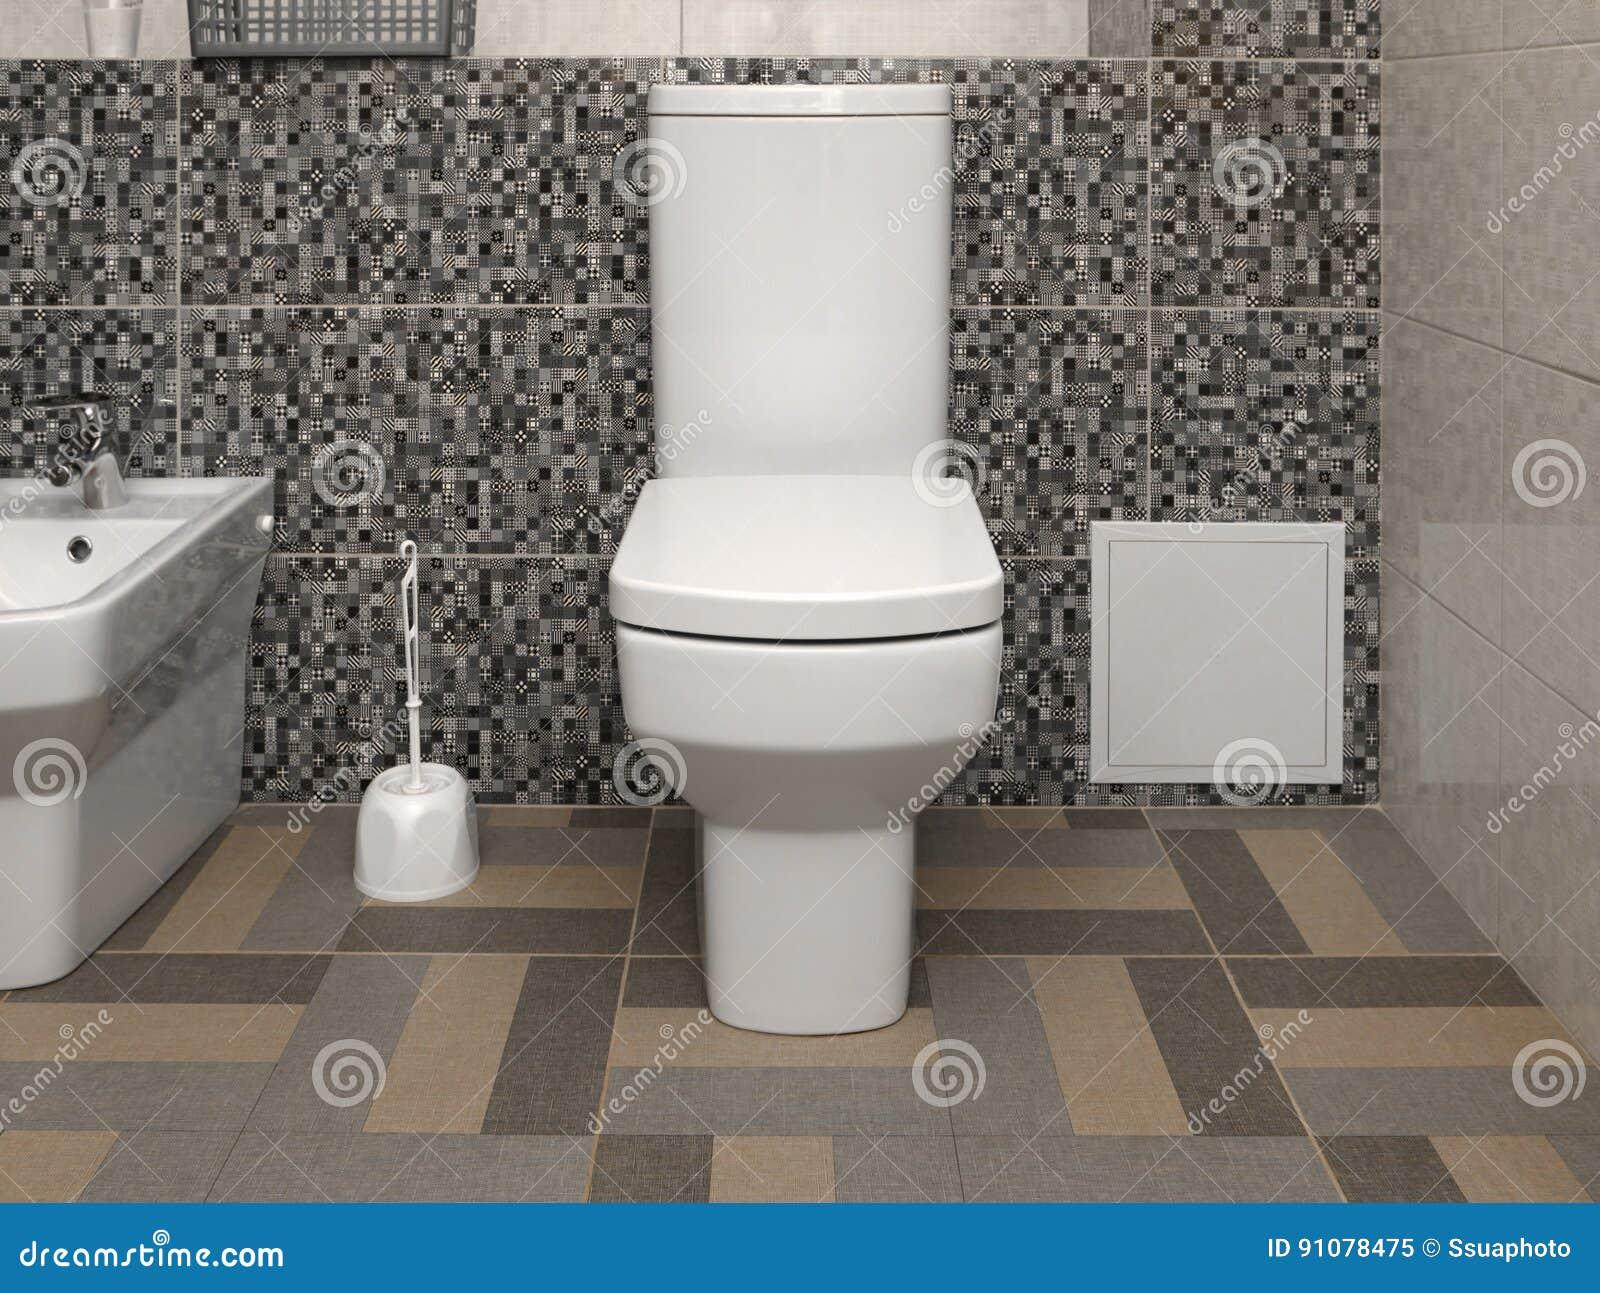 Cuvette Des Toilettes Moderne Blanche Image stock - Image du ...